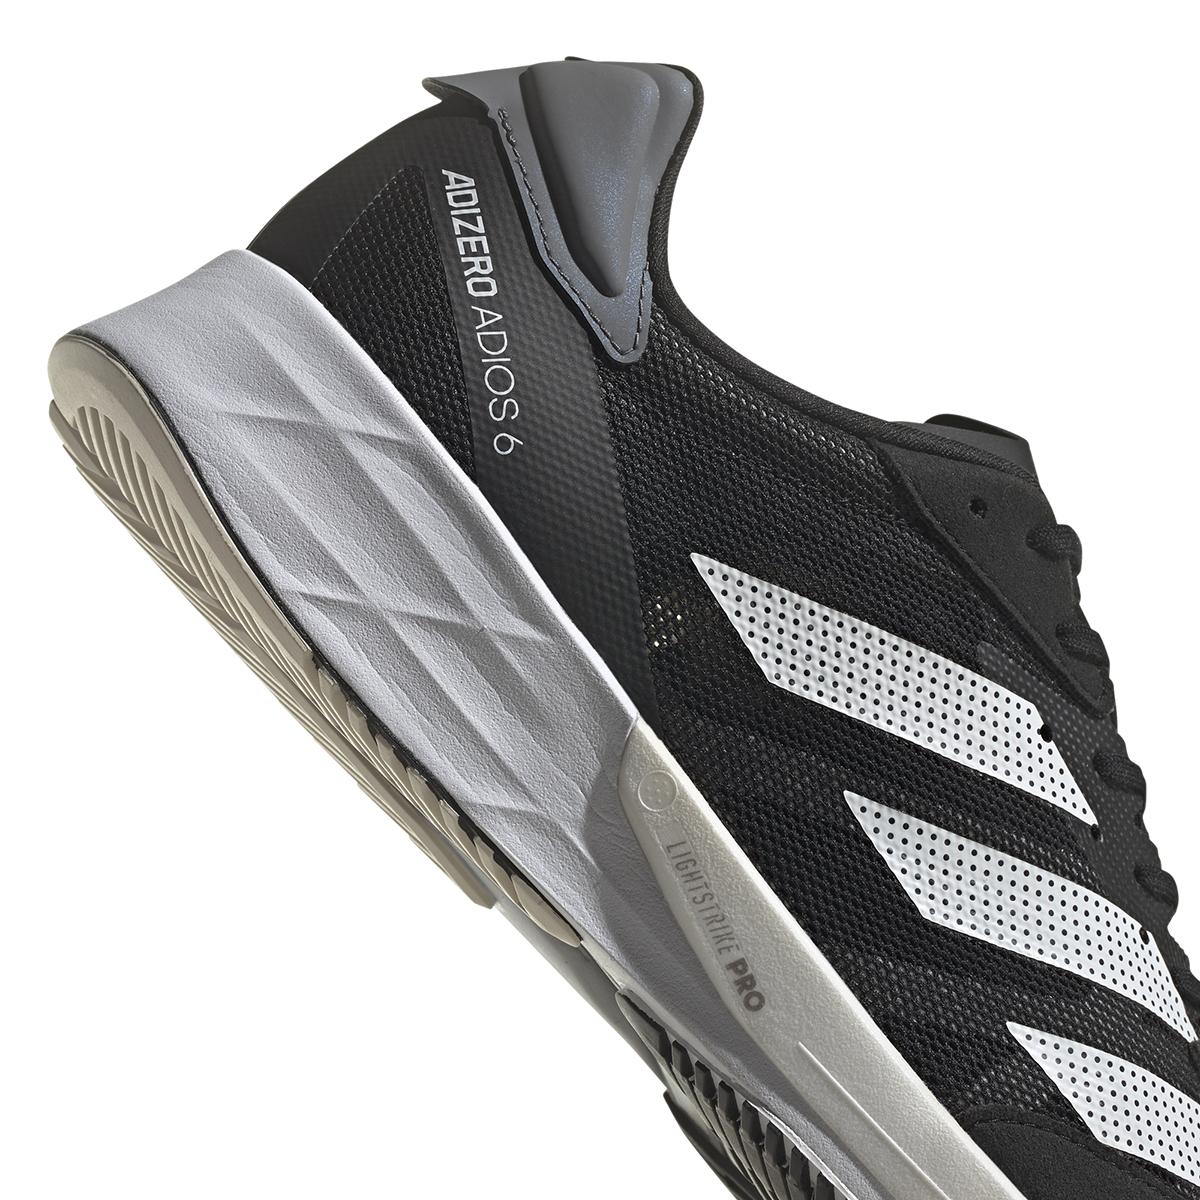 Men's Adidas Adizero Adios 6 Running Shoe - Color: Black/White/Grey - Size: 6 - Width: Regular, Black/White/Grey, large, image 3